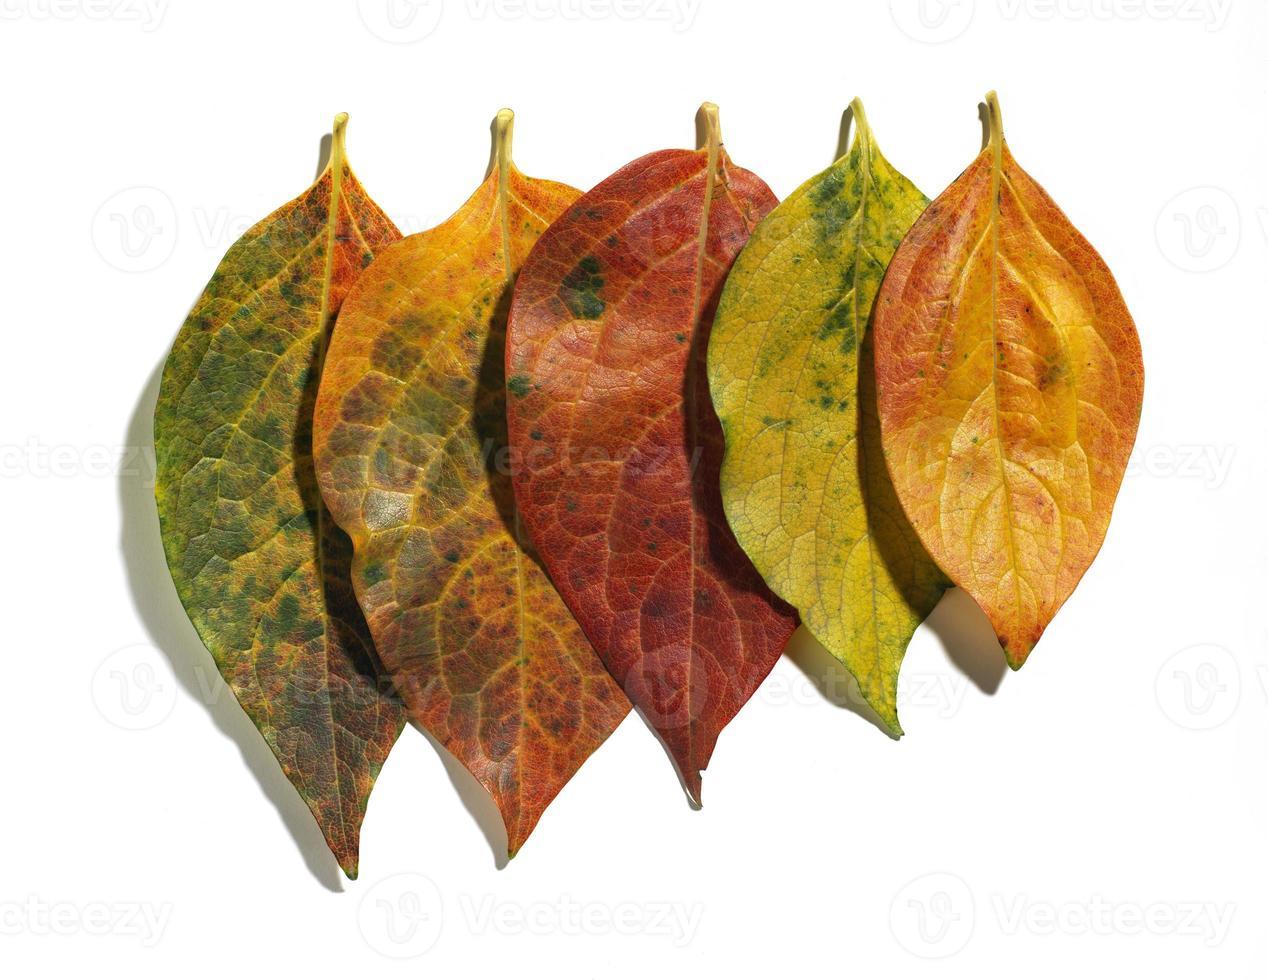 Herbst foto